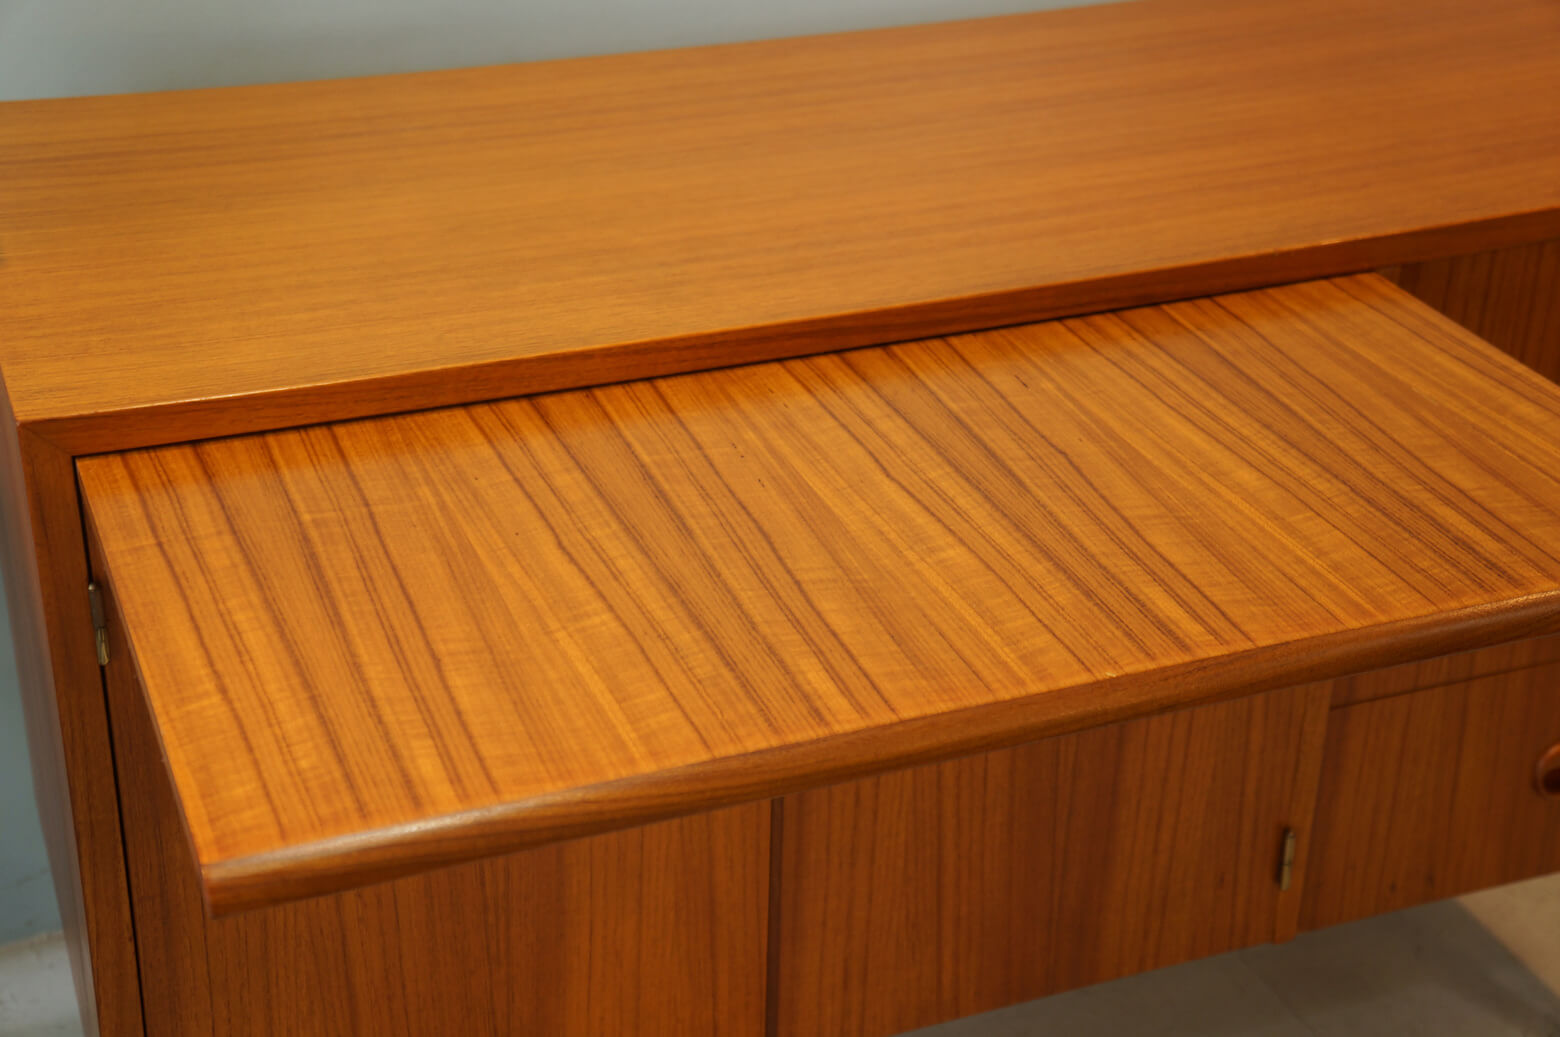 Swedish Vintage Side Board System Shelf/スウェーデン ヴィンテージ サイドボード システムシェルフ